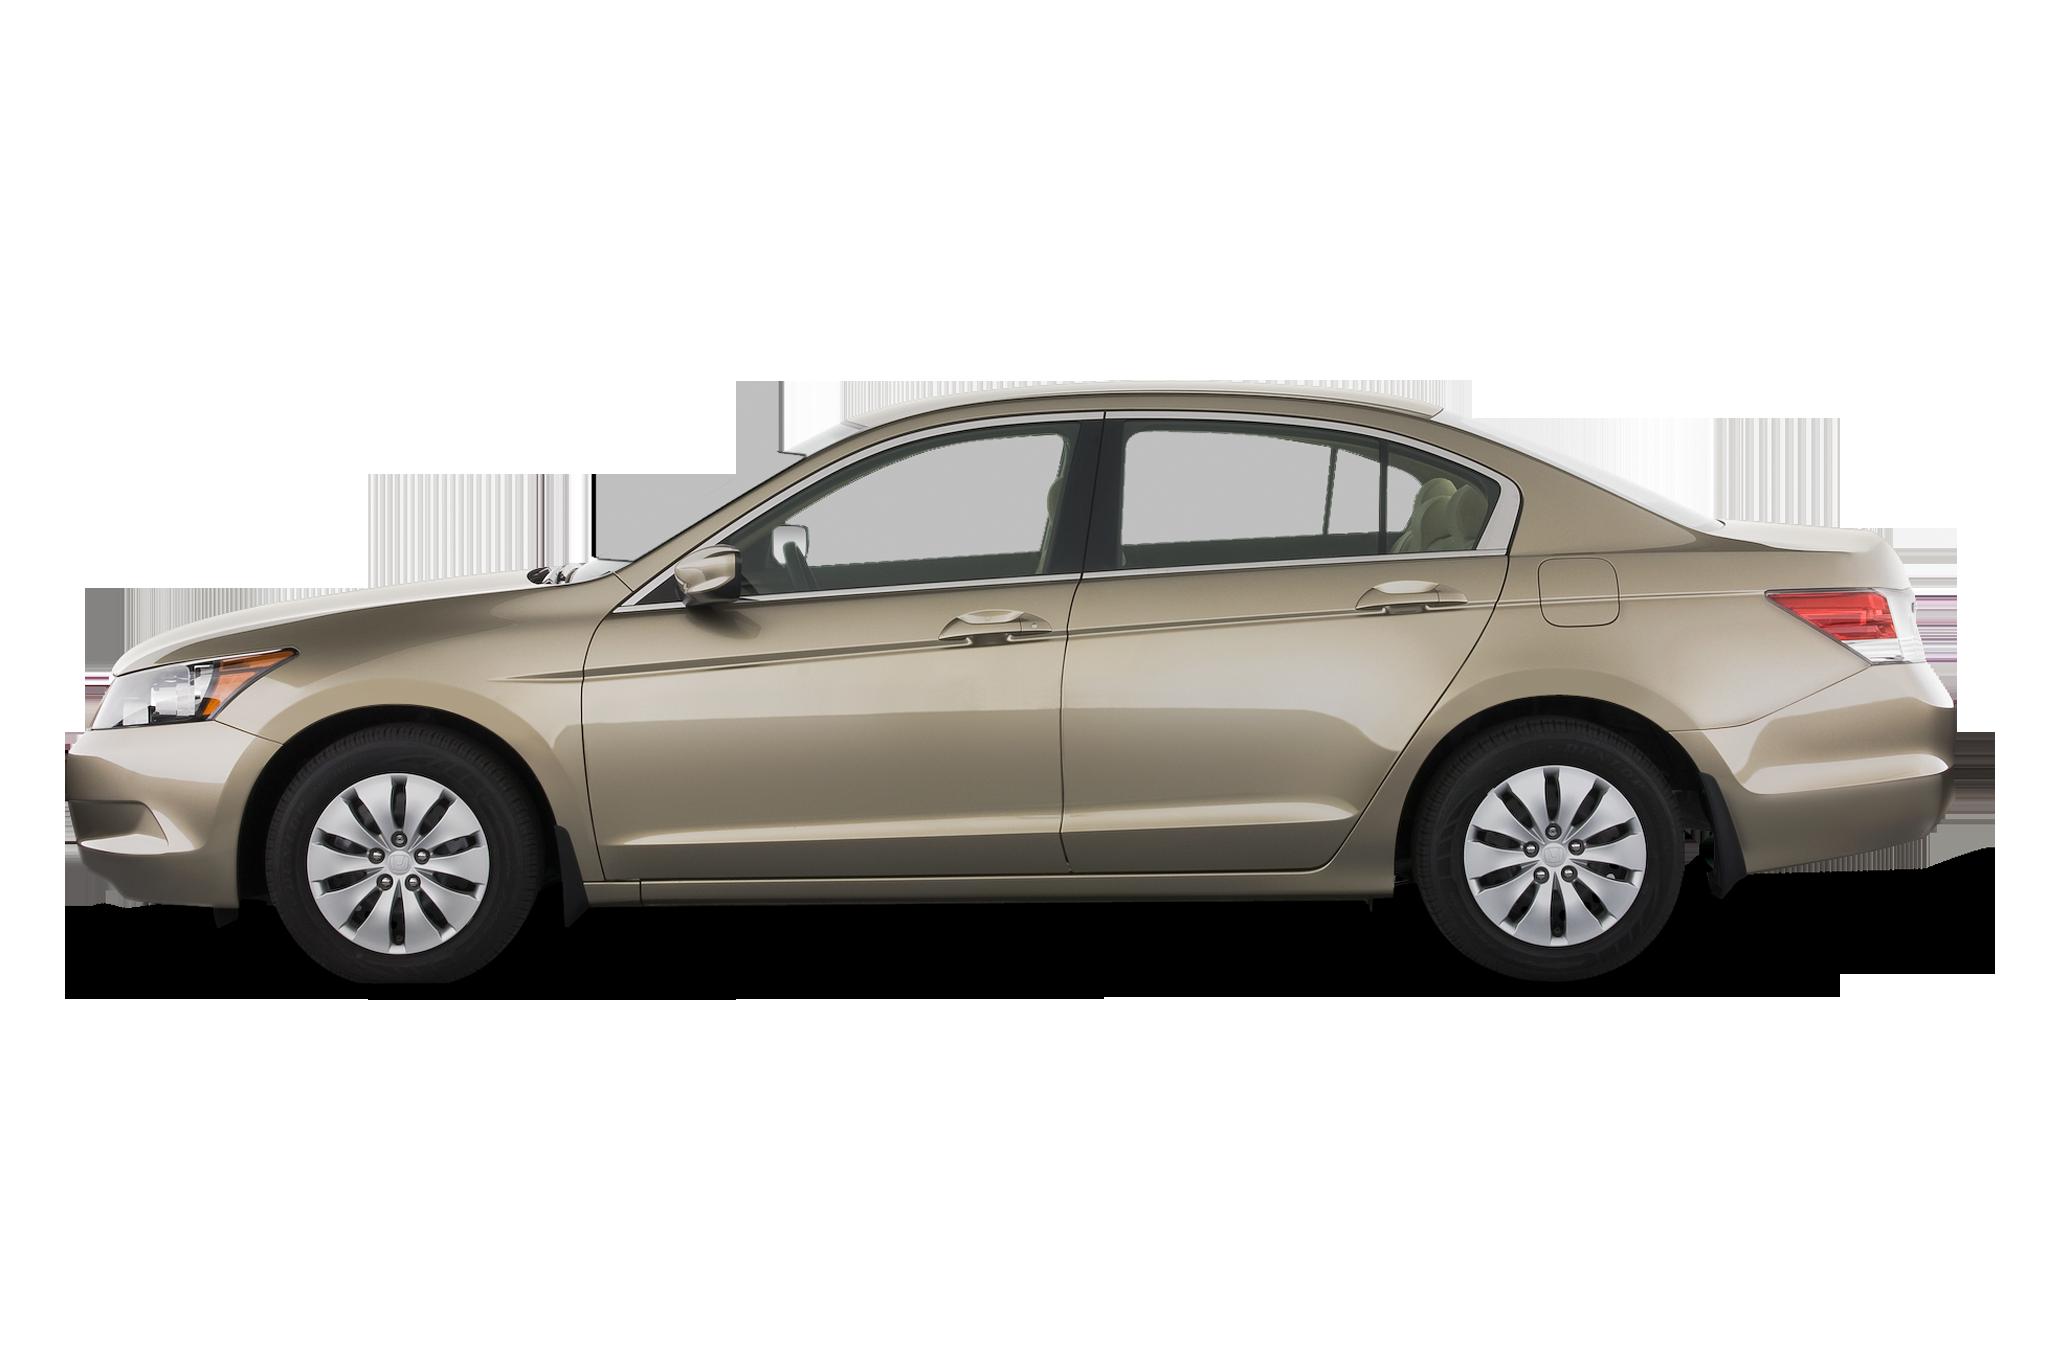 Mugen Accessories Available for 2010 Honda Accord Sedan